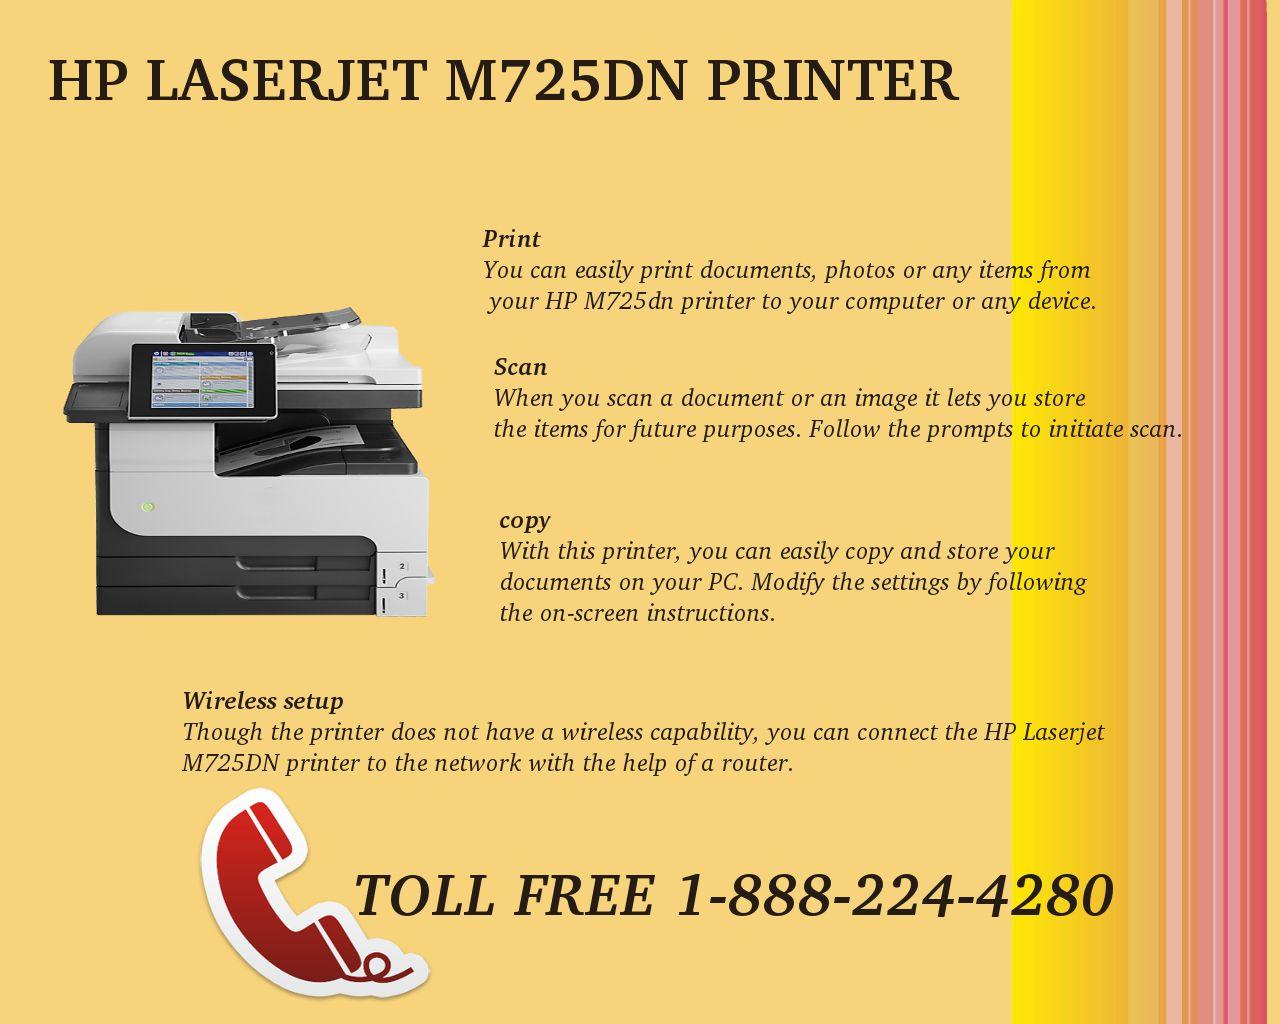 hp laserjet p1505 service user manual how to and user guide rh taxibermuda co hp laserjet p1505 printer driver download for windows 7 64 bit hp laserjet p1505 printer driver